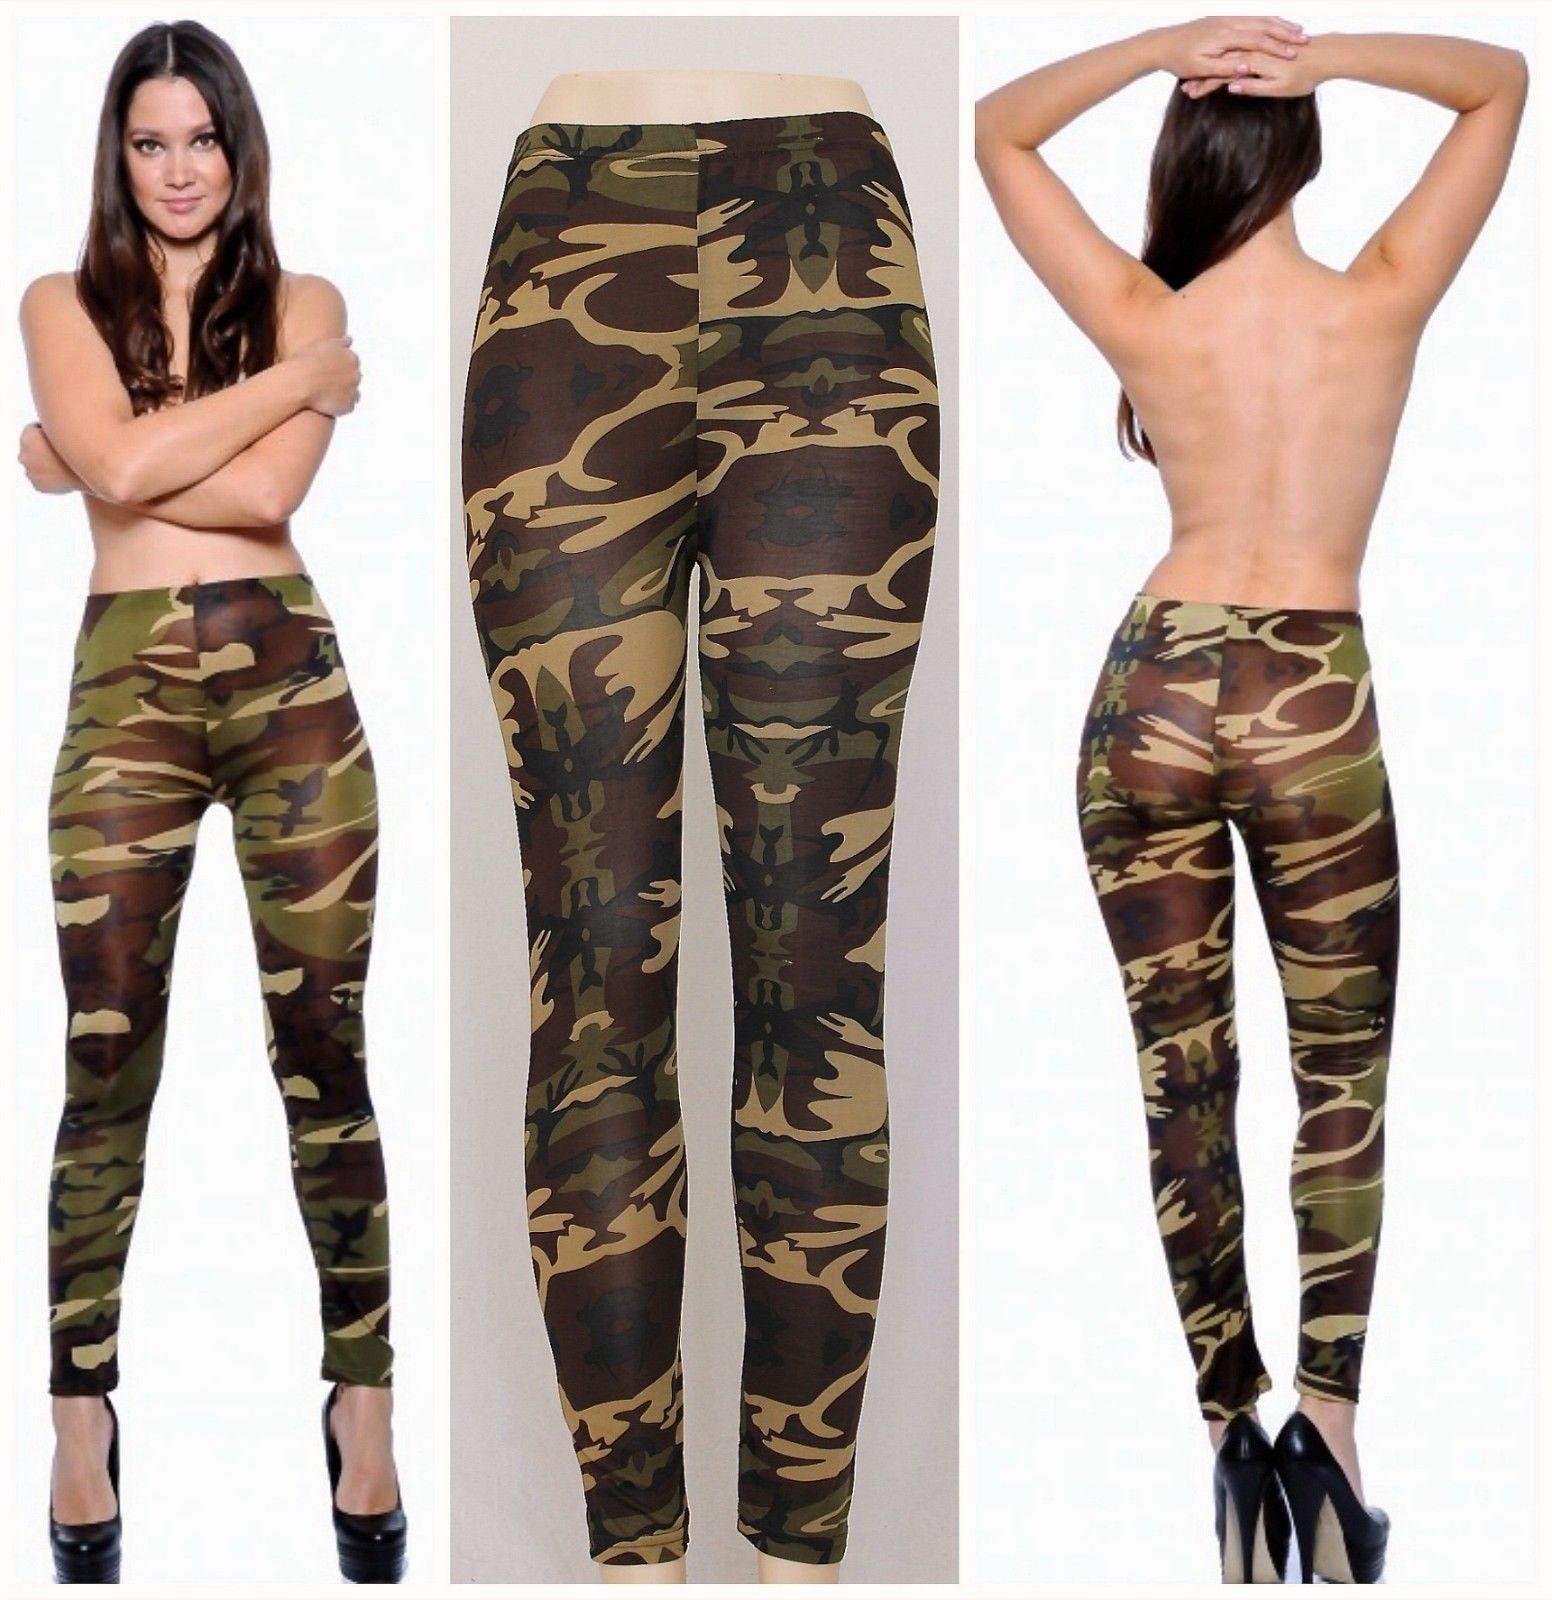 d5ef89f67a616e Camouflage Sexy Leggings Army Olive Green Super Stretch Camo Leggings True  Rock | eBay